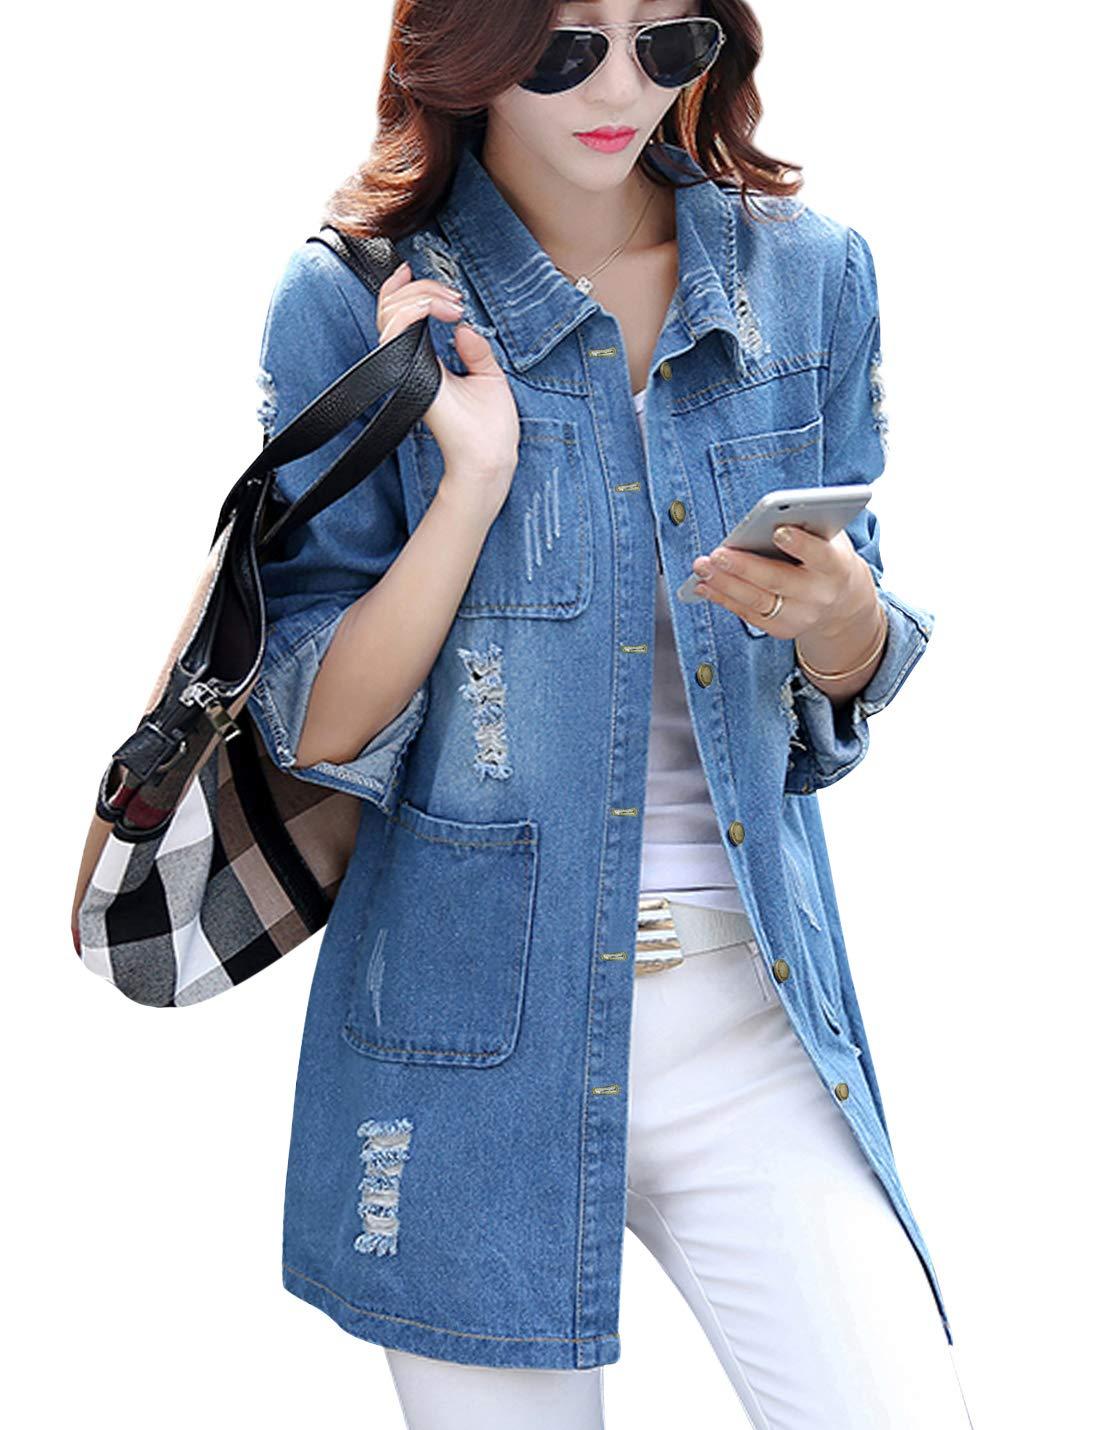 Tanming Women's Casual Lapel Slim Long Sleeve Denim Outercoat Jacket Windbreaker (Medium, Blue TM2) by Tanming